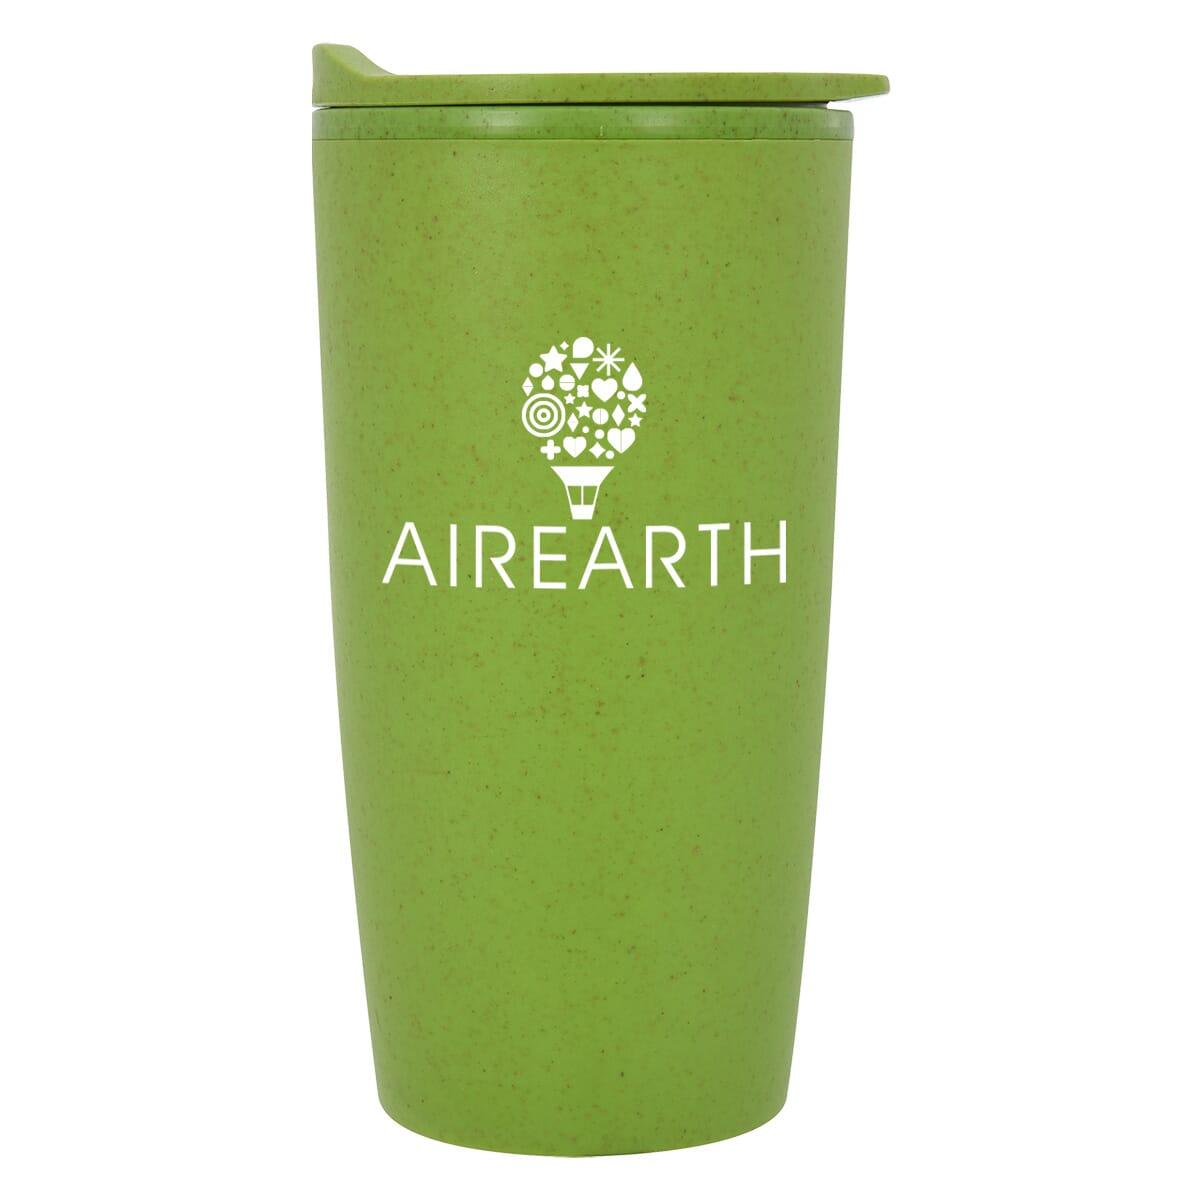 green travel mug made of eco friendly wheat material